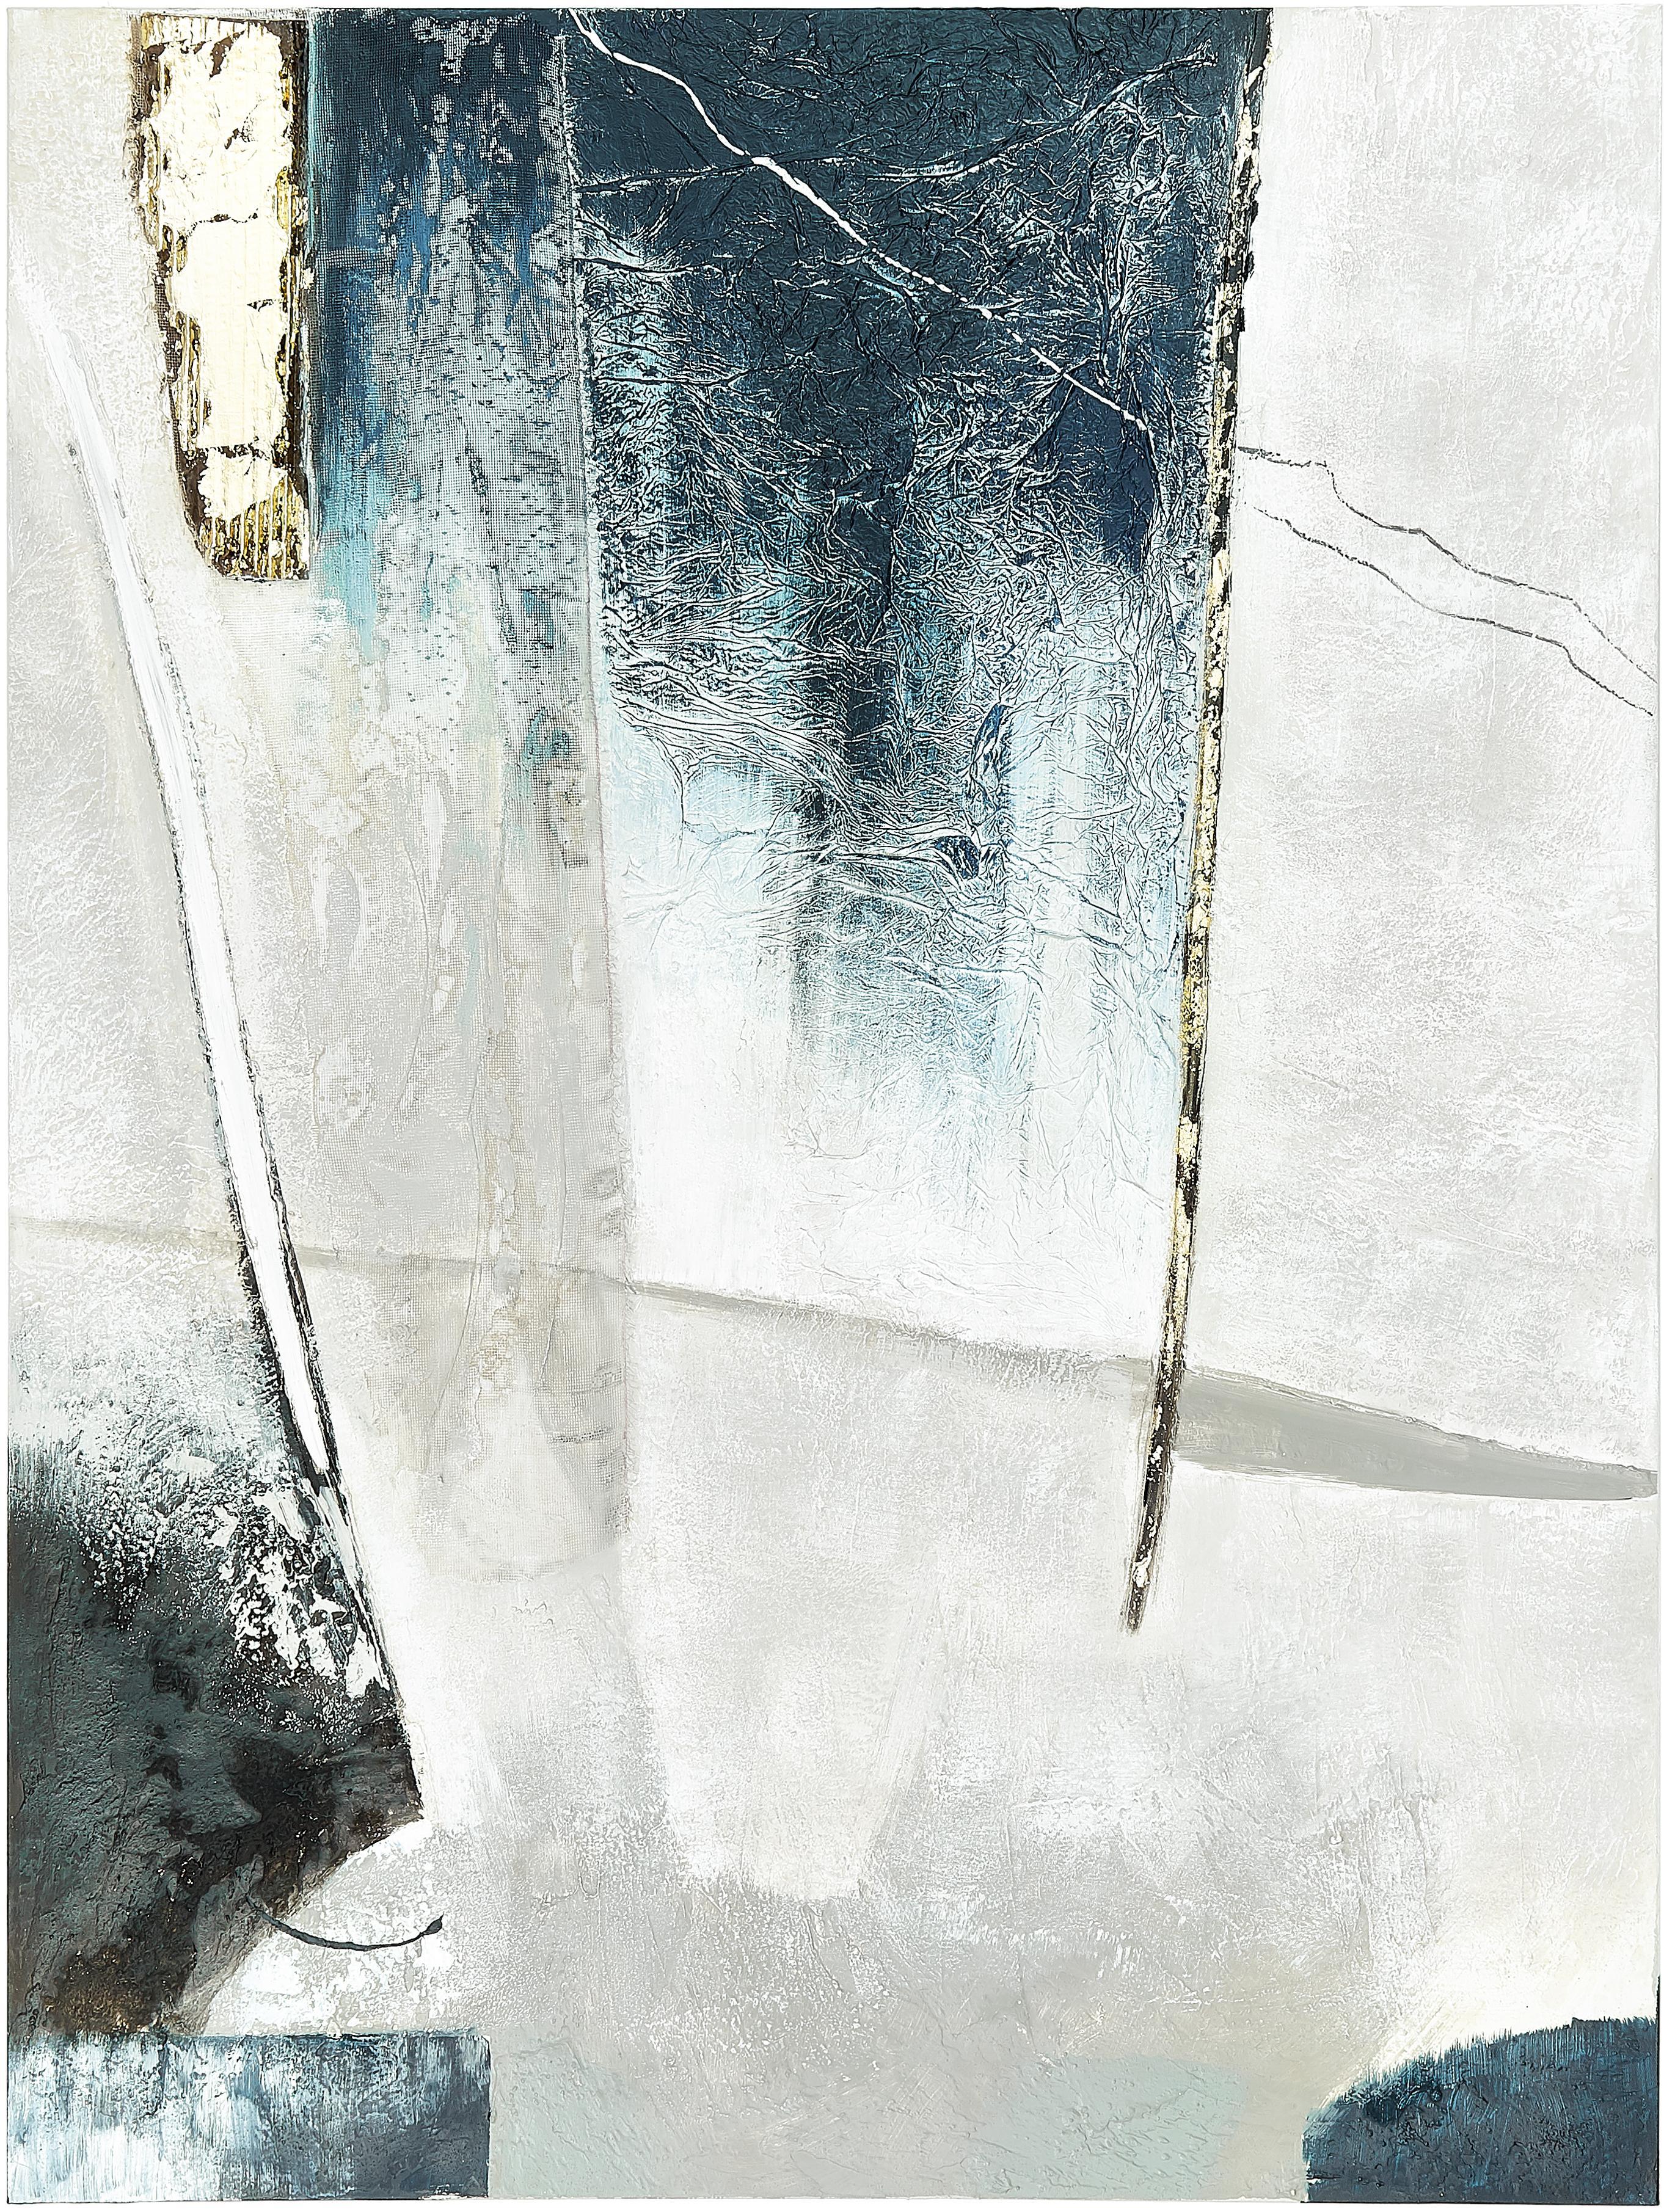 Handgeschilderde canvasdoek Golden Blue I, Afbeelding: olieverf op linnen (300 g, Multicolour, 90 x 120 cm